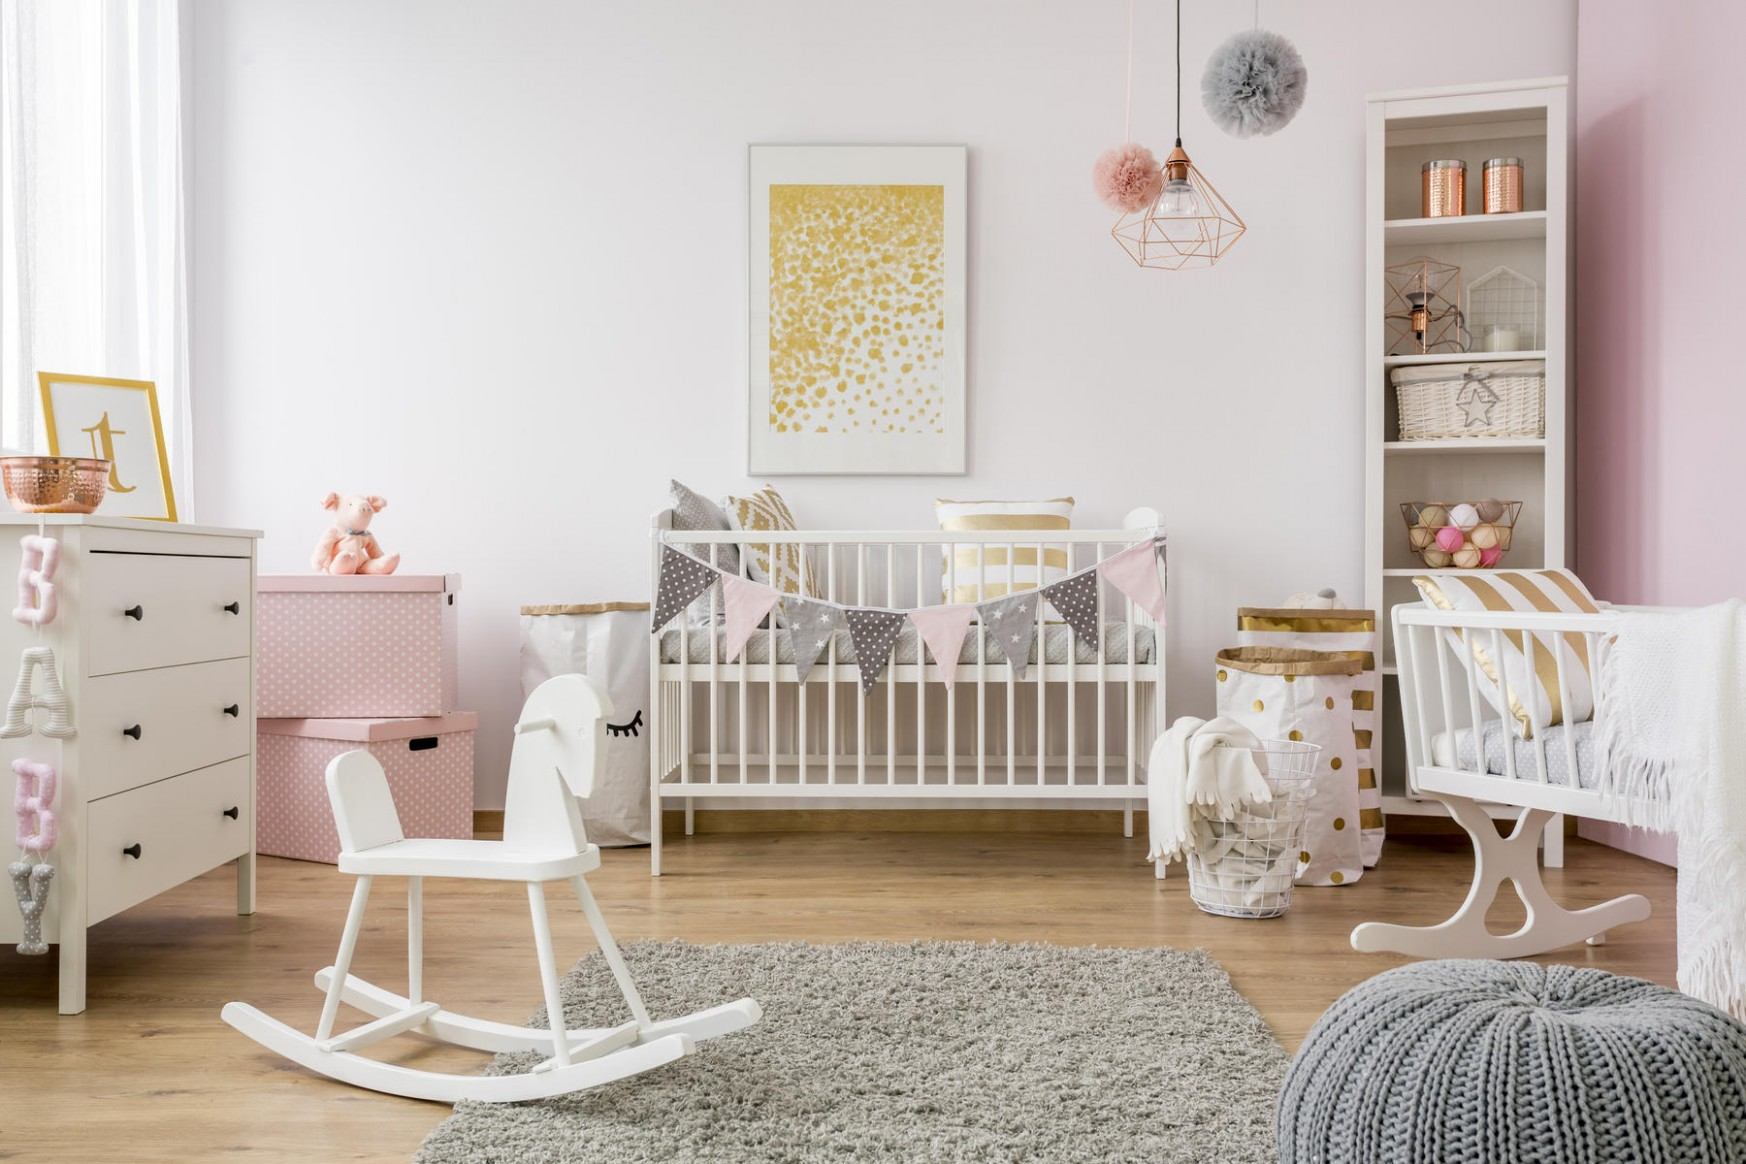 Baby Nursery: Design Ideas, Furniture & Cribs  Parents - Baby Room Photos